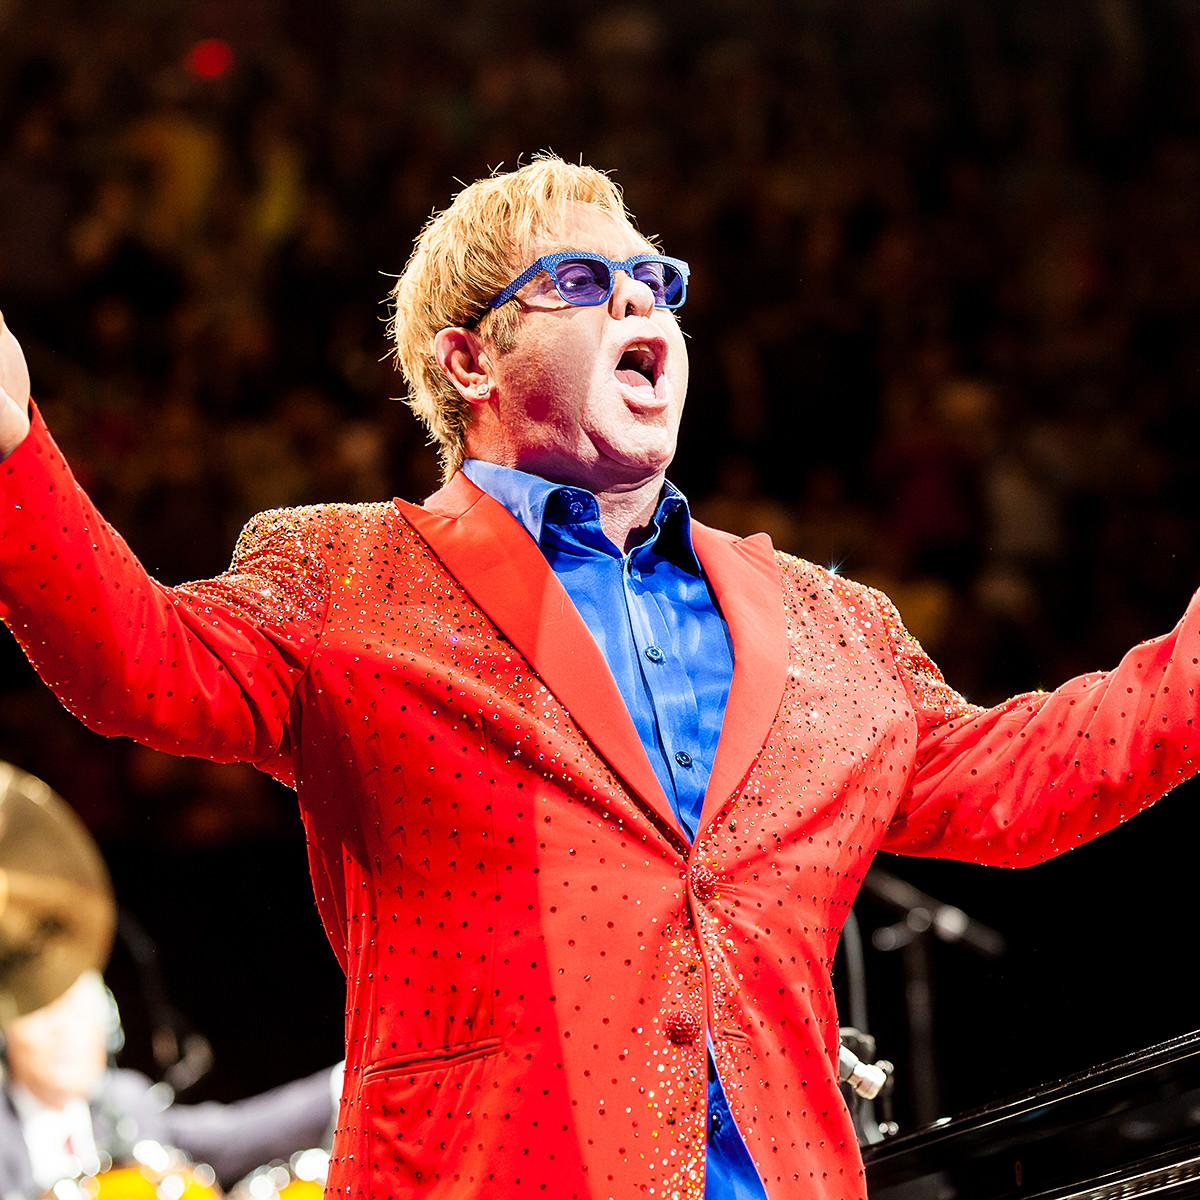 Elton John's Wild Show: Surprise Shoutout, A Fight & Biden